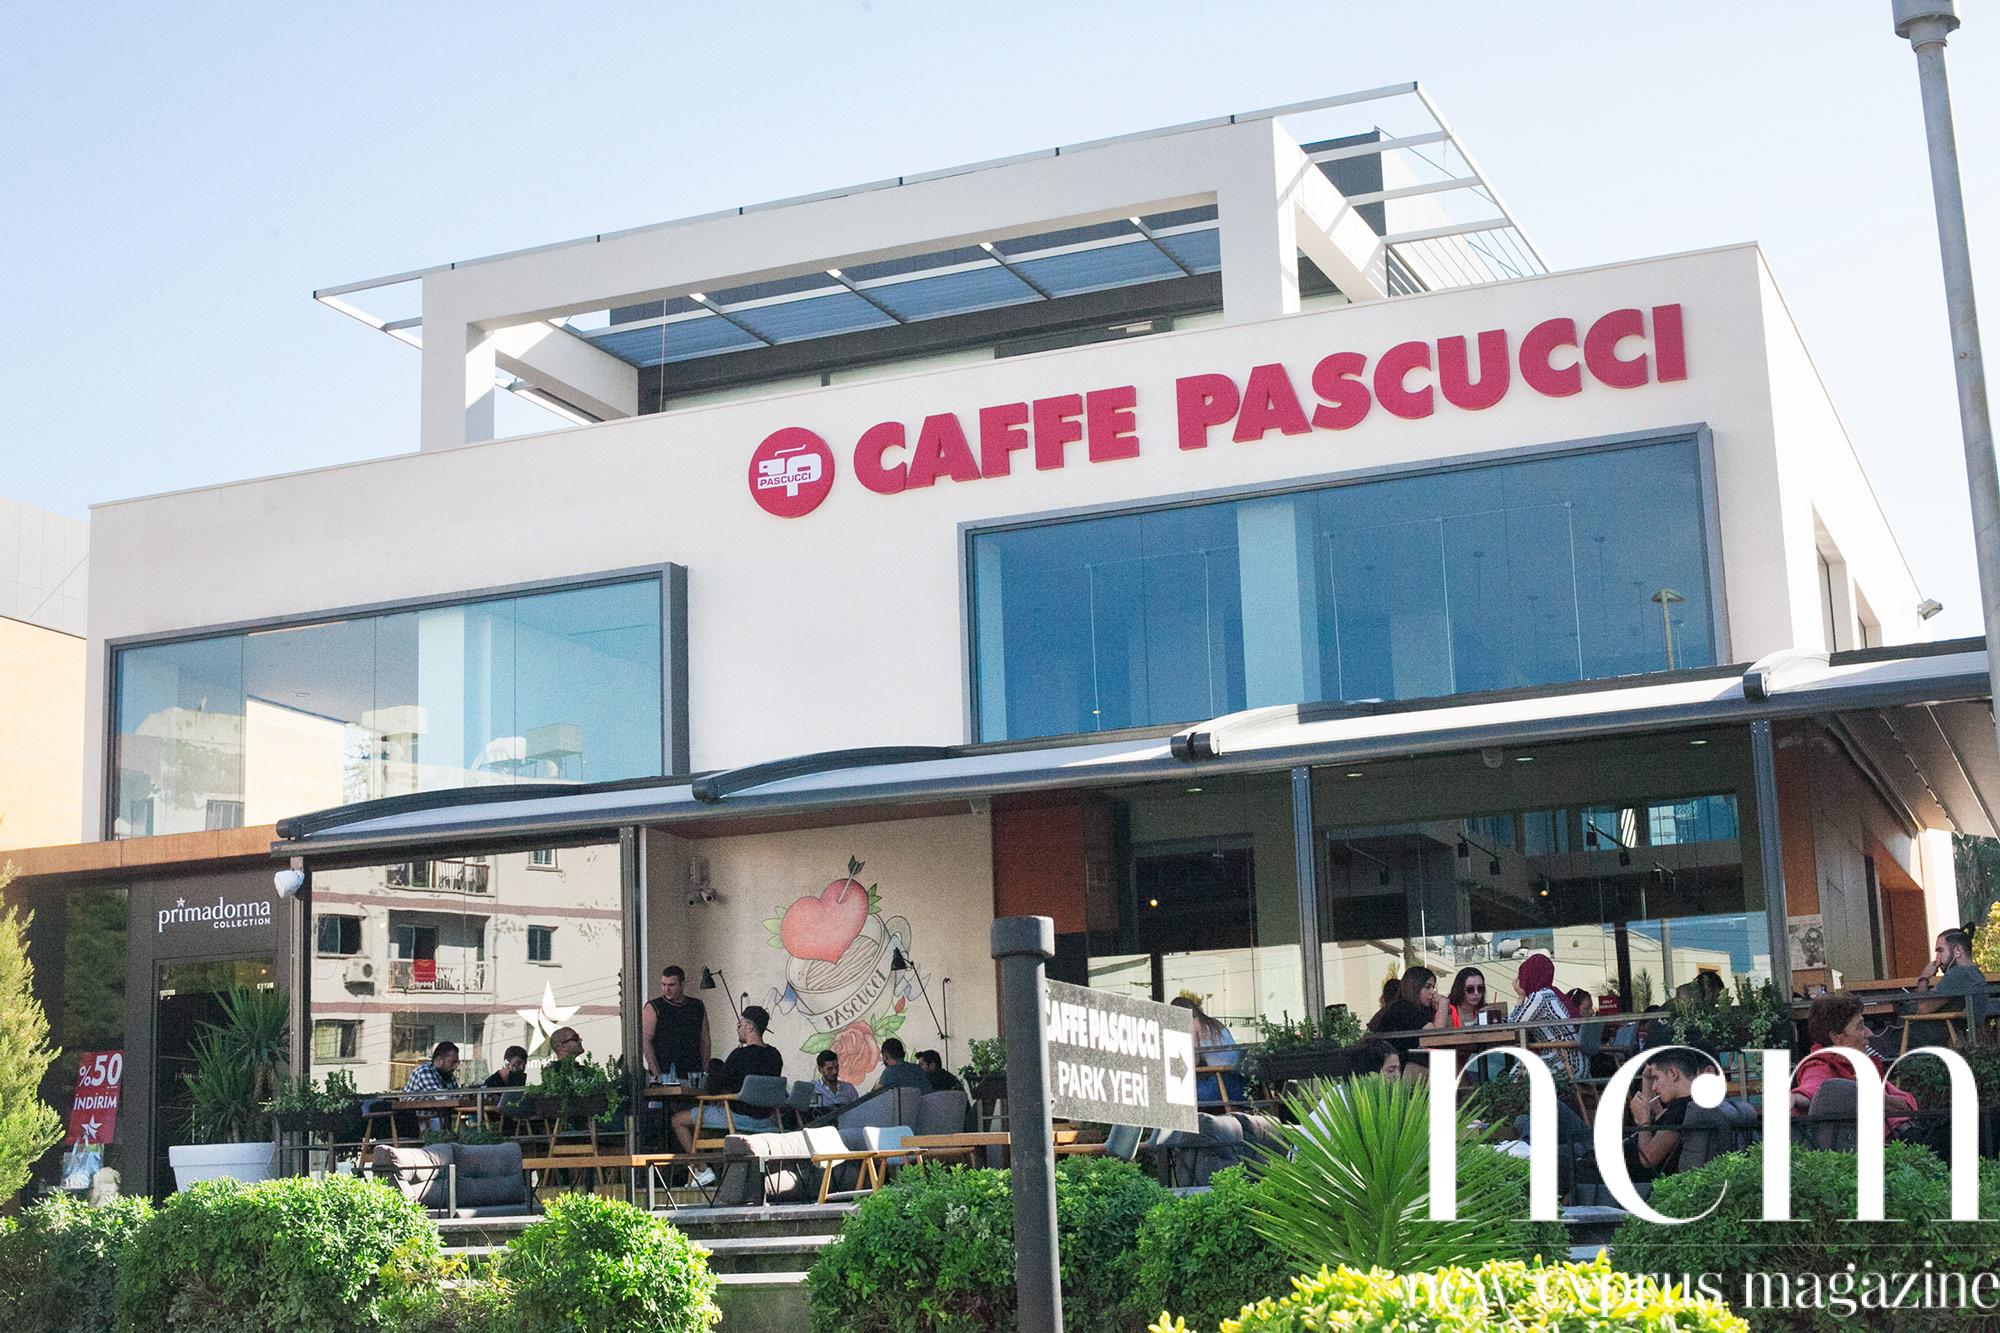 international coffee chain Caffe Pascucci